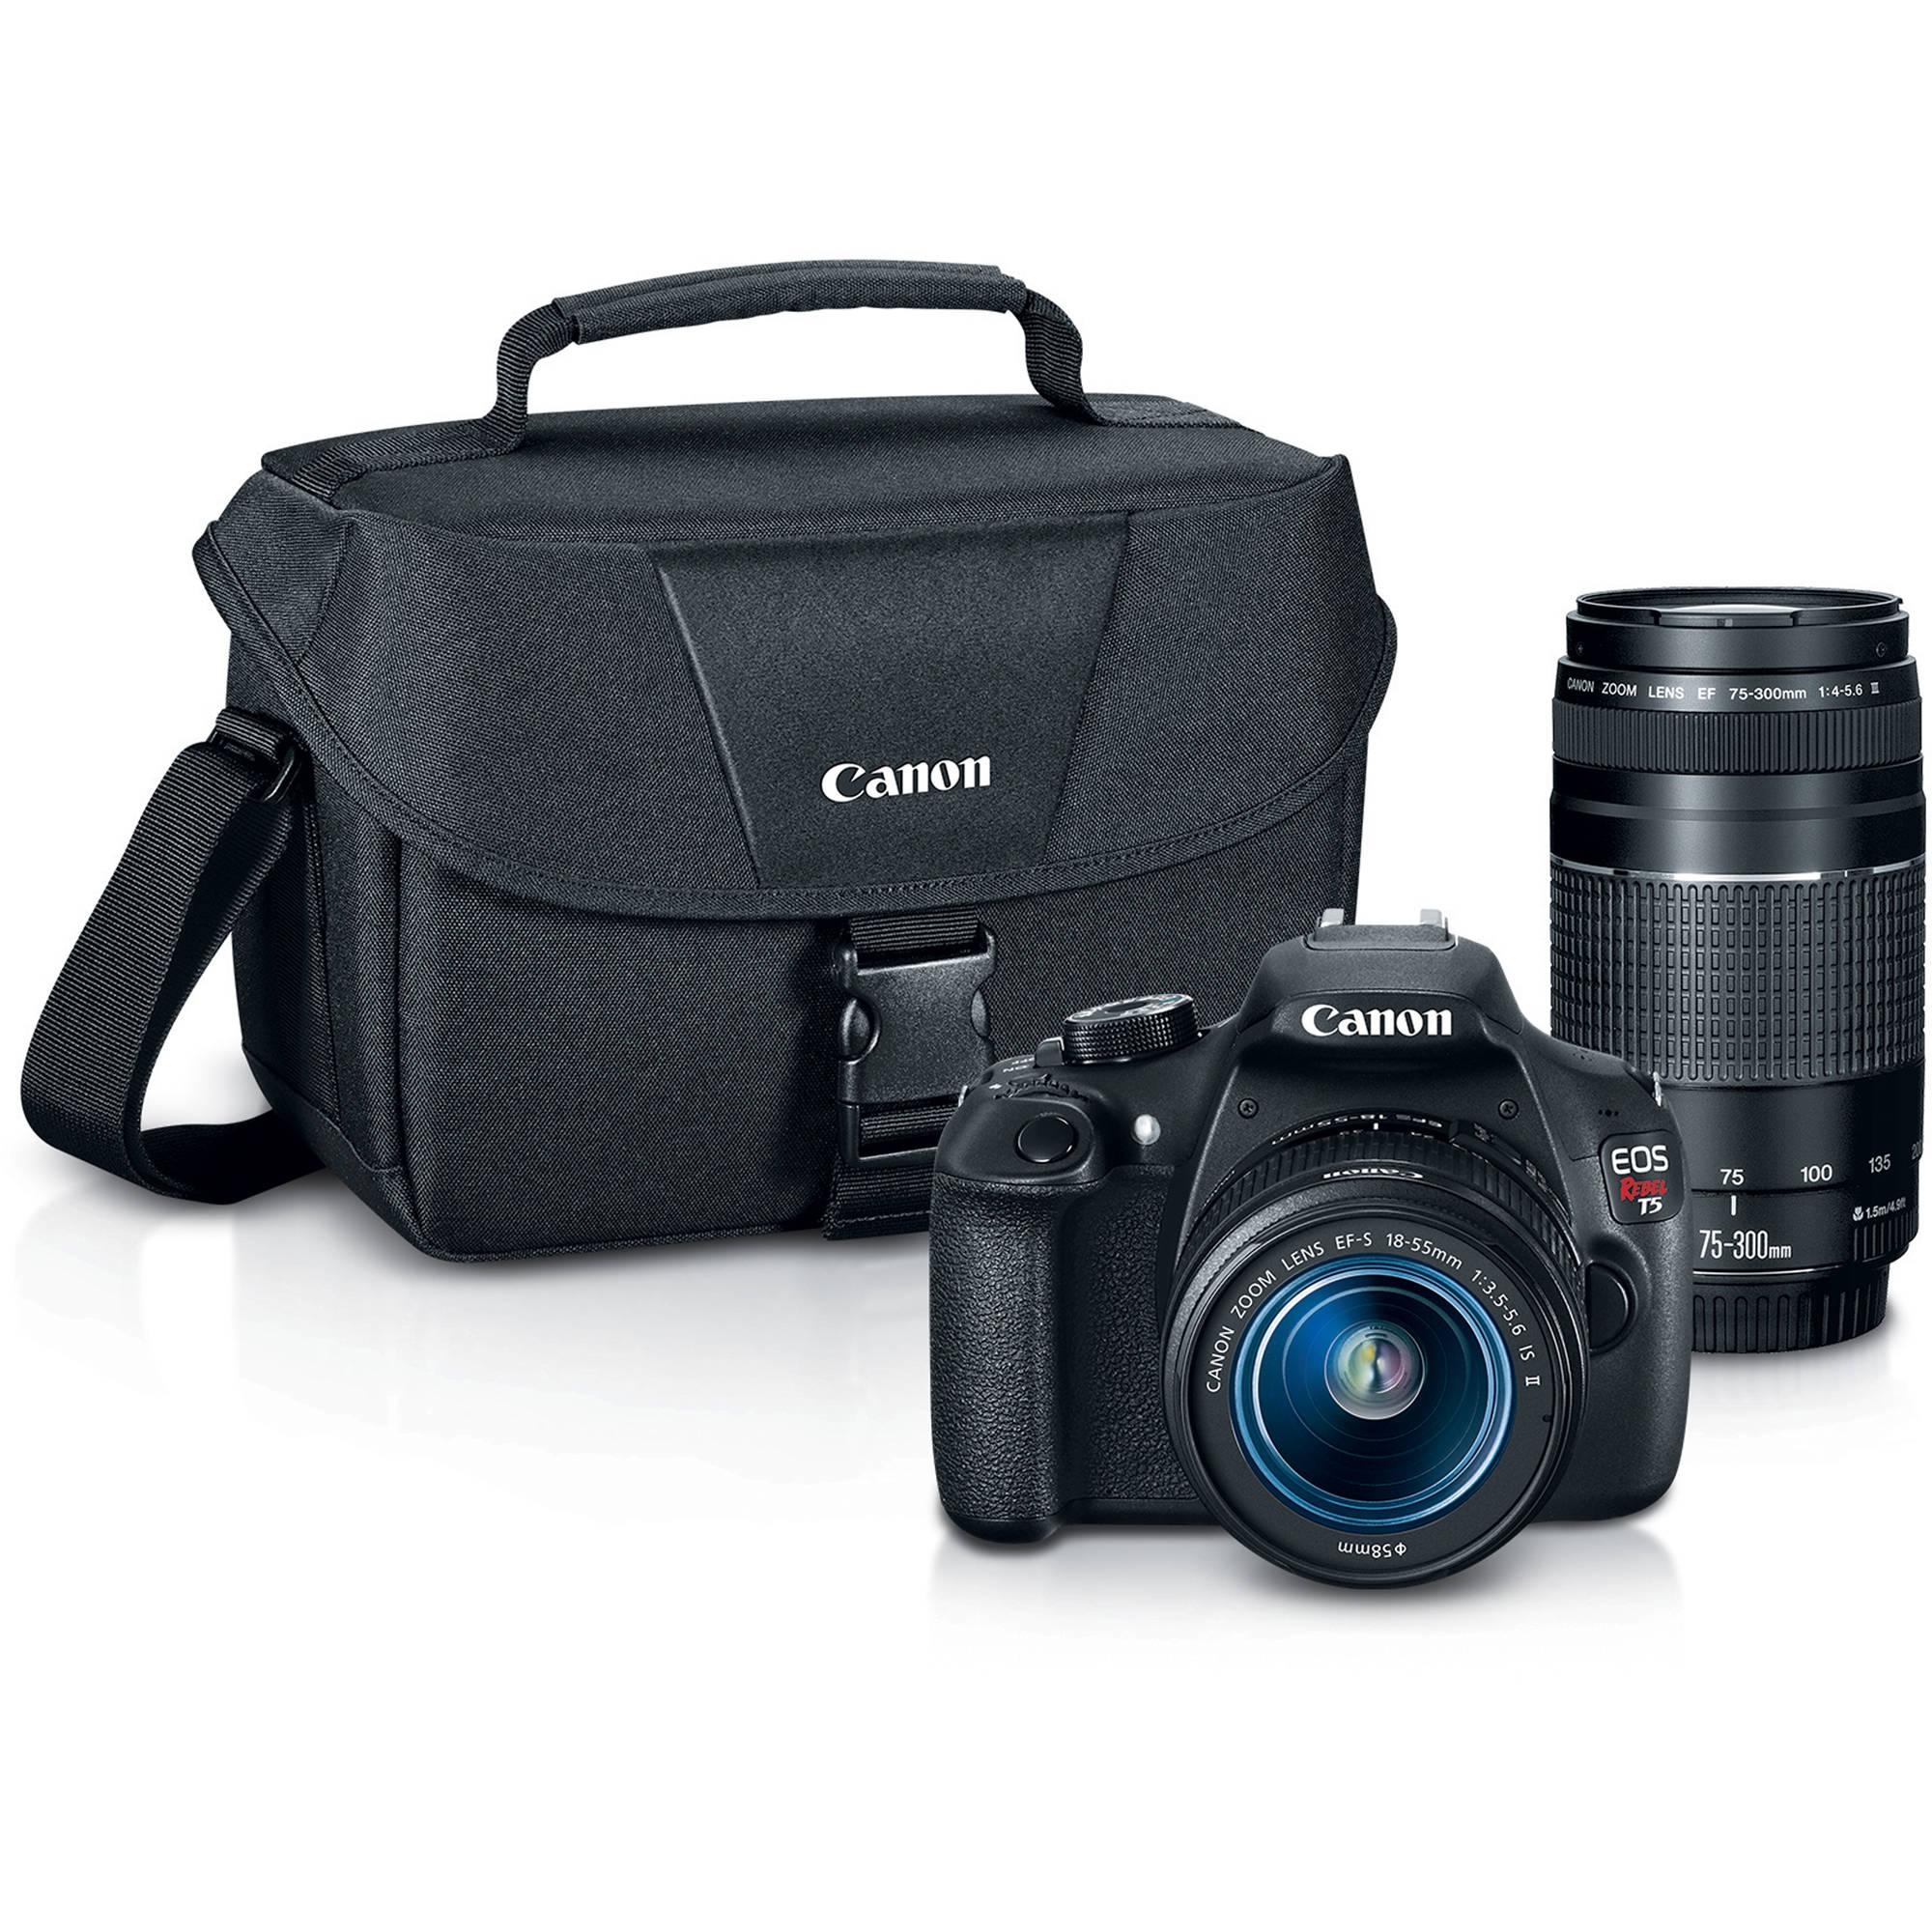 Camera Dslr Camera Deals Canada dslr cameras digital slr bh photo canon eos rebel t5 camera with 18 55mm and 75 300mm lenses bundle